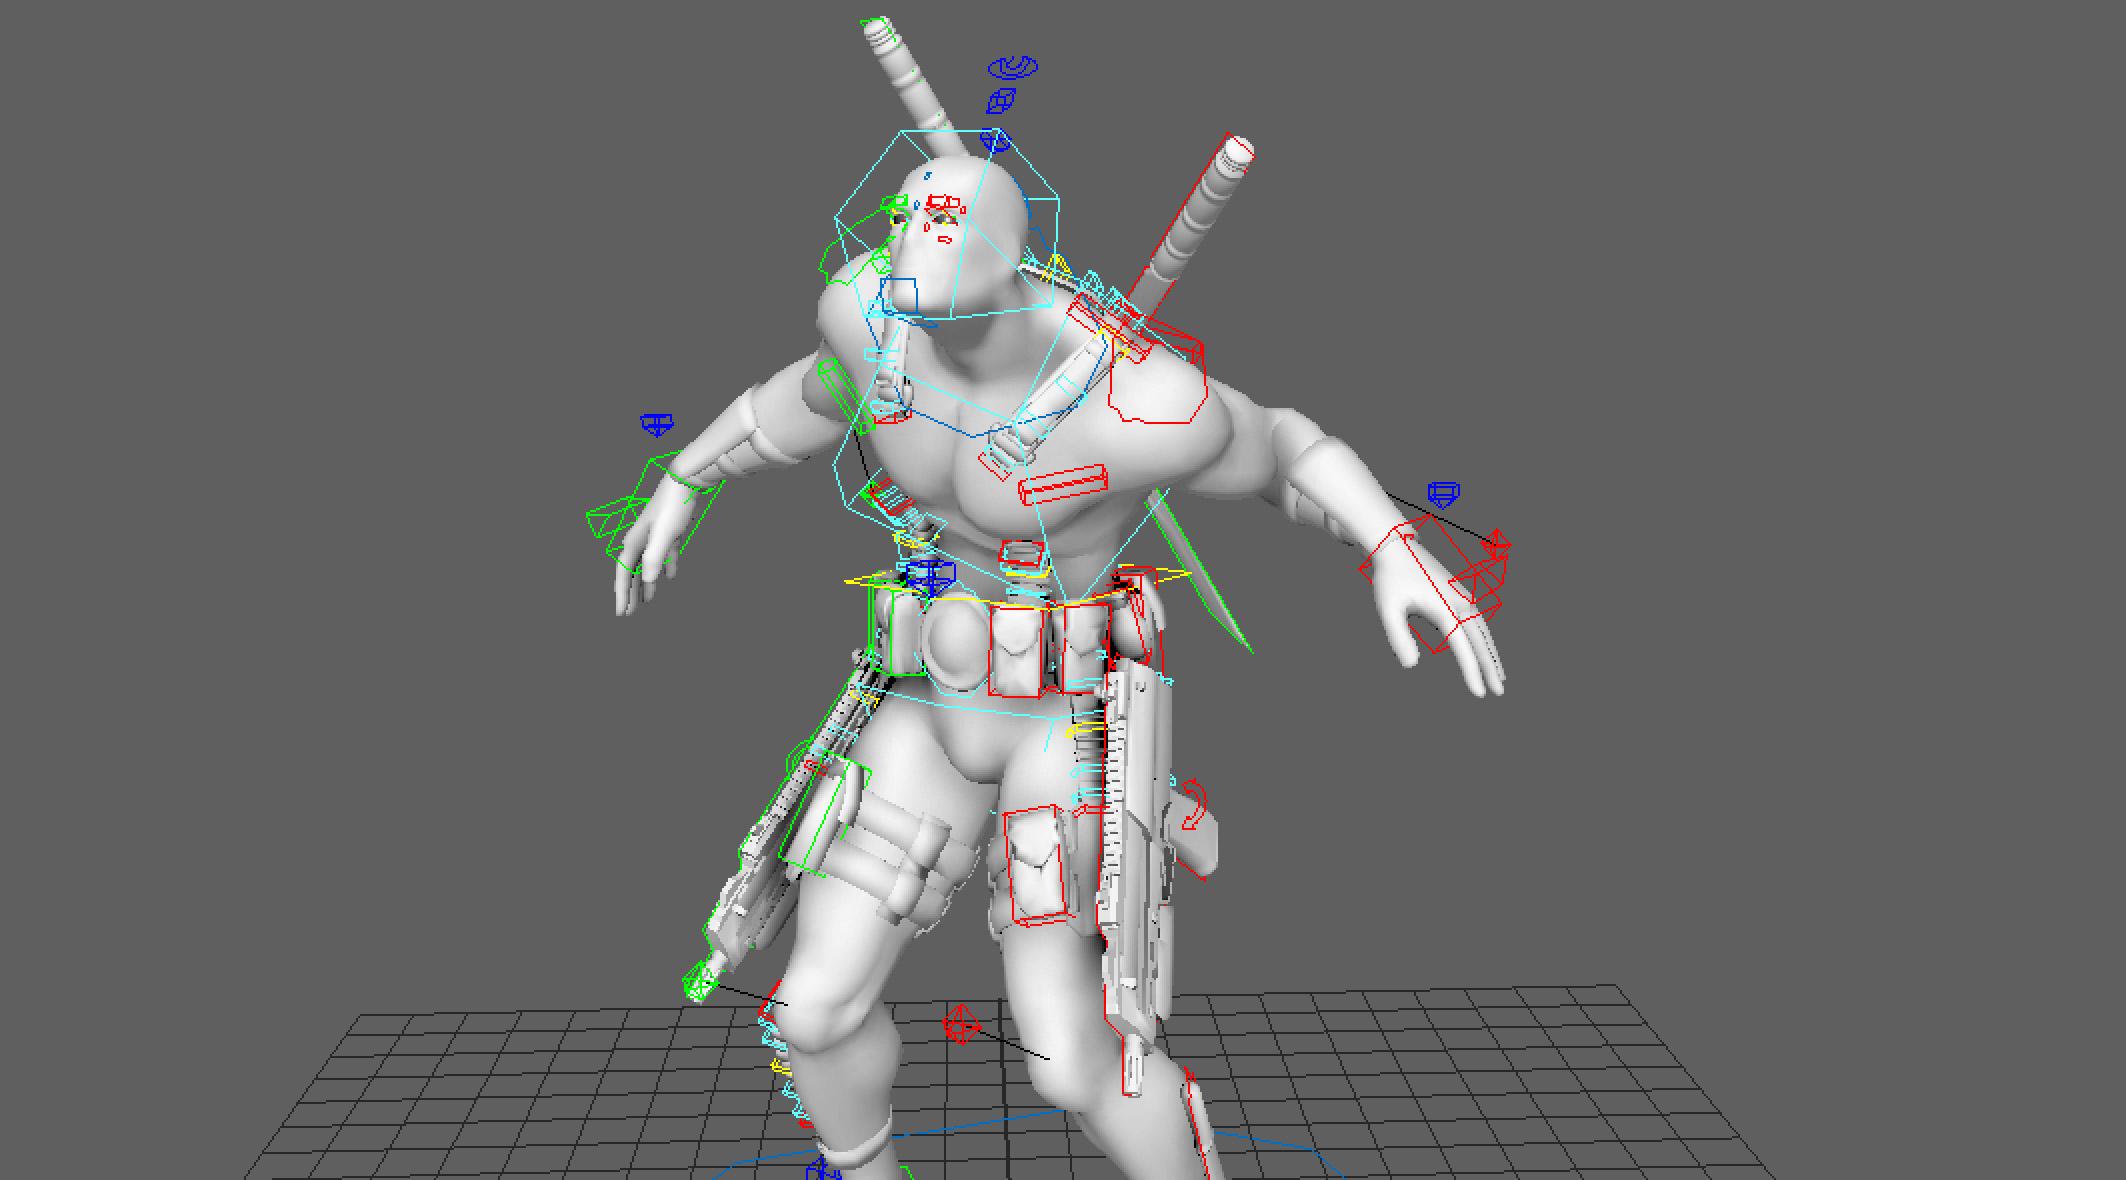 Download Free Rigged 3d Model | 3DArt